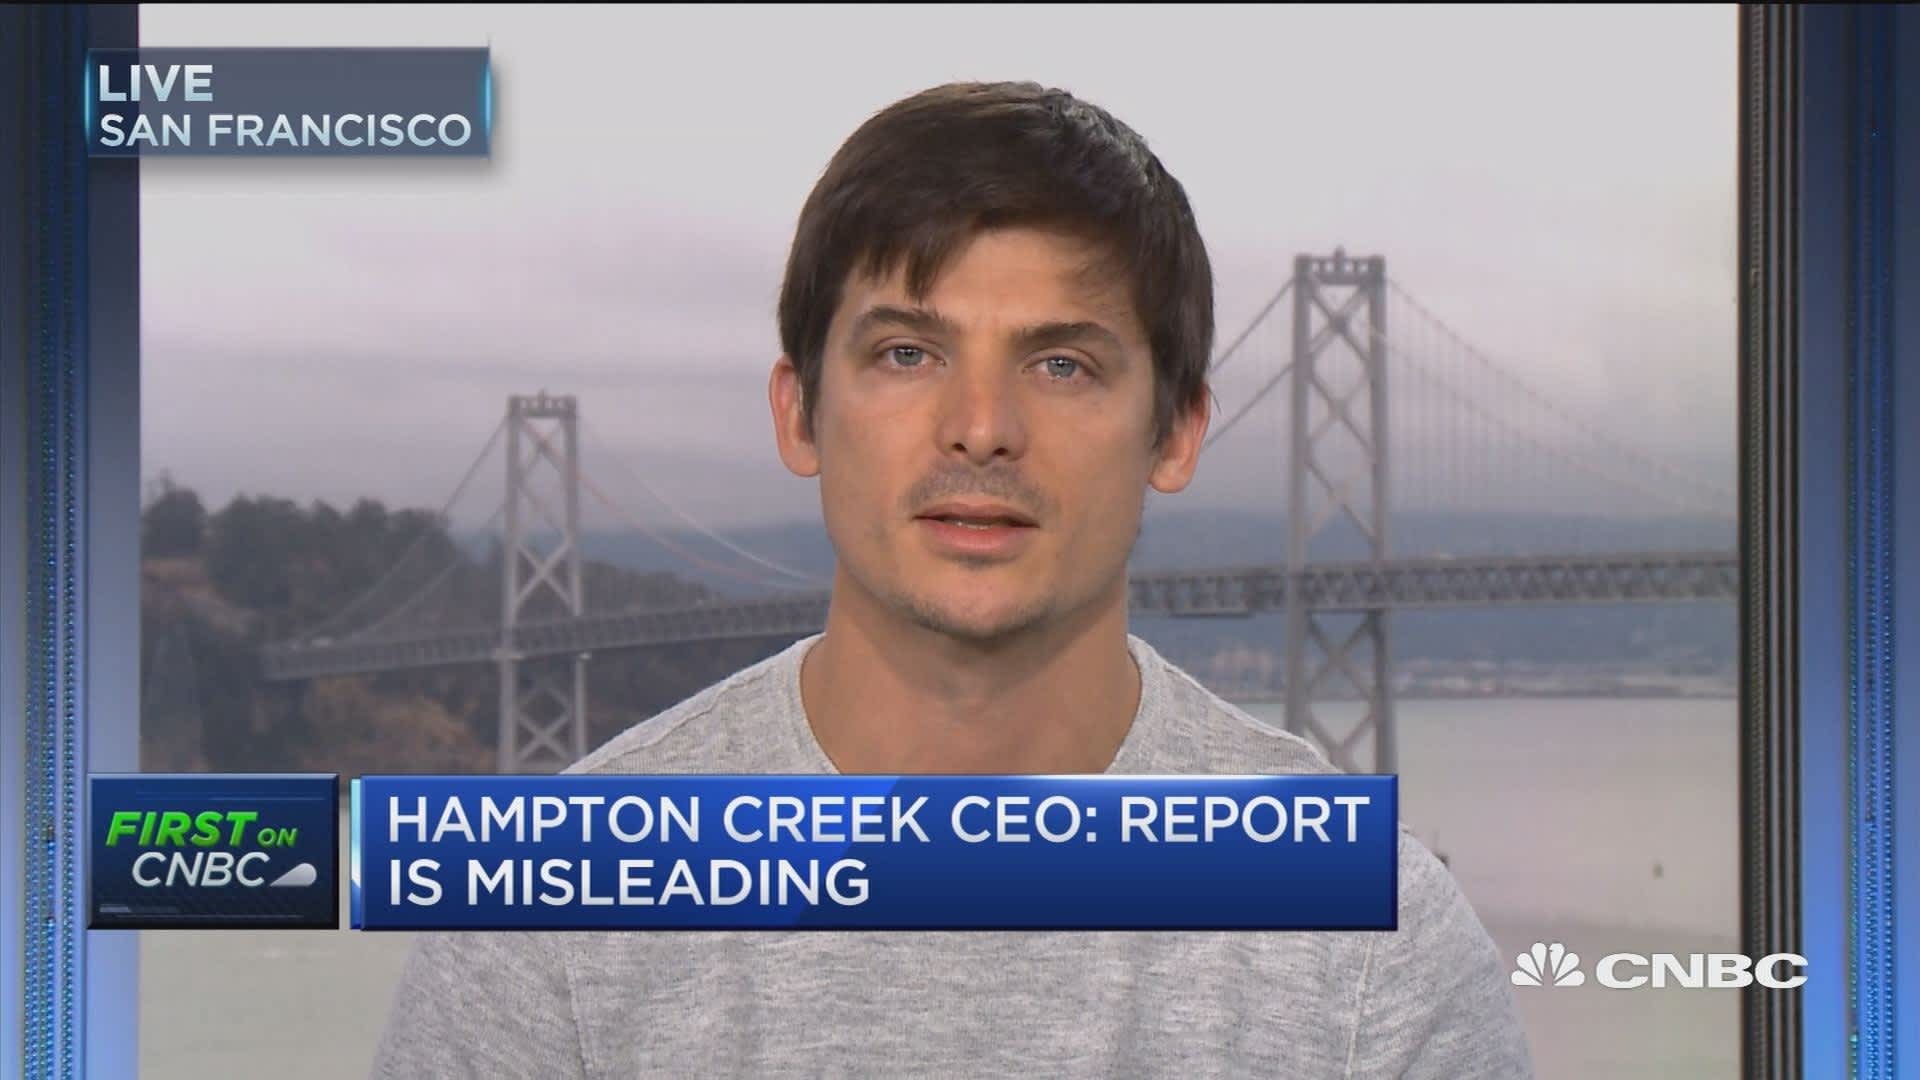 Hampton Creek Ceo Said To Be Last Man Standing As Directors Resign